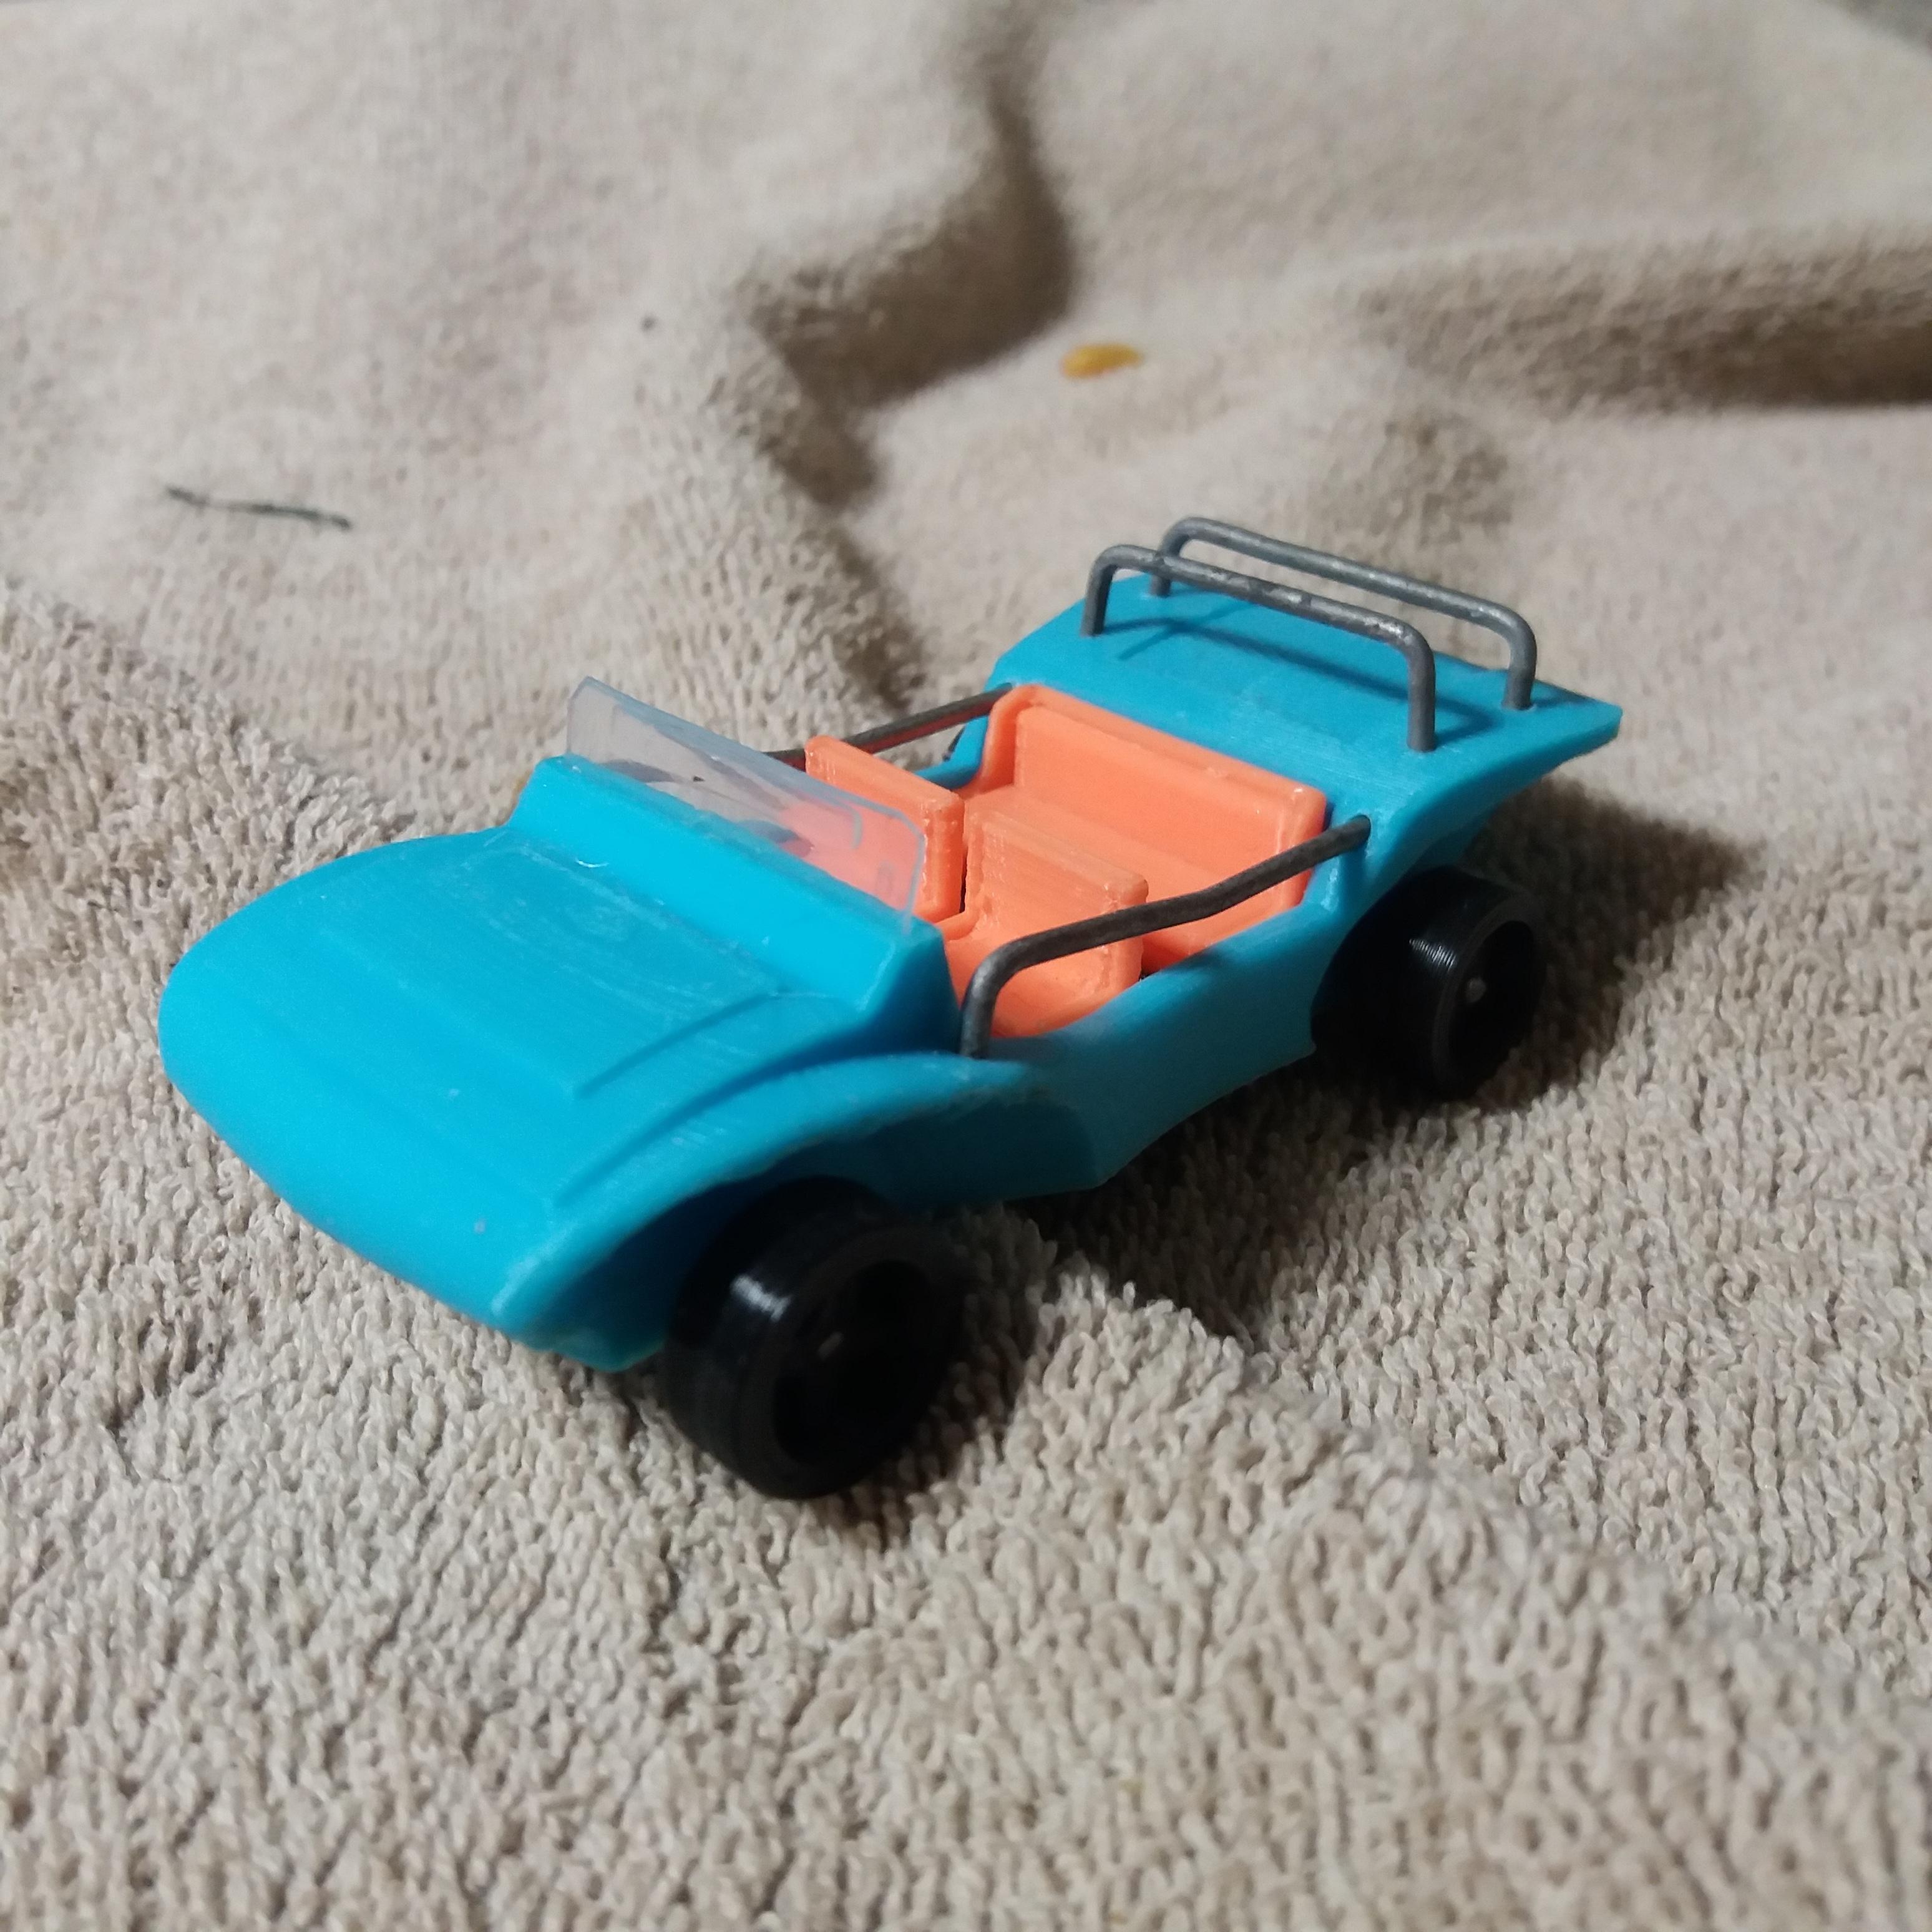 Buggy 3.jpg Télécharger fichier STL  Buggy,  • Plan imprimable en 3D, gerbat